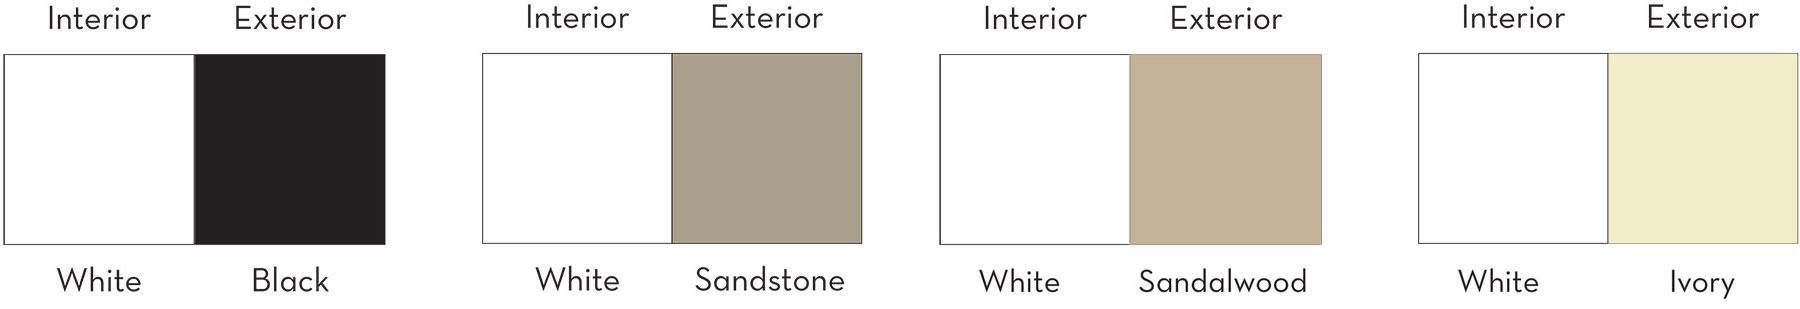 Exterior_Capstock_colour_WC201